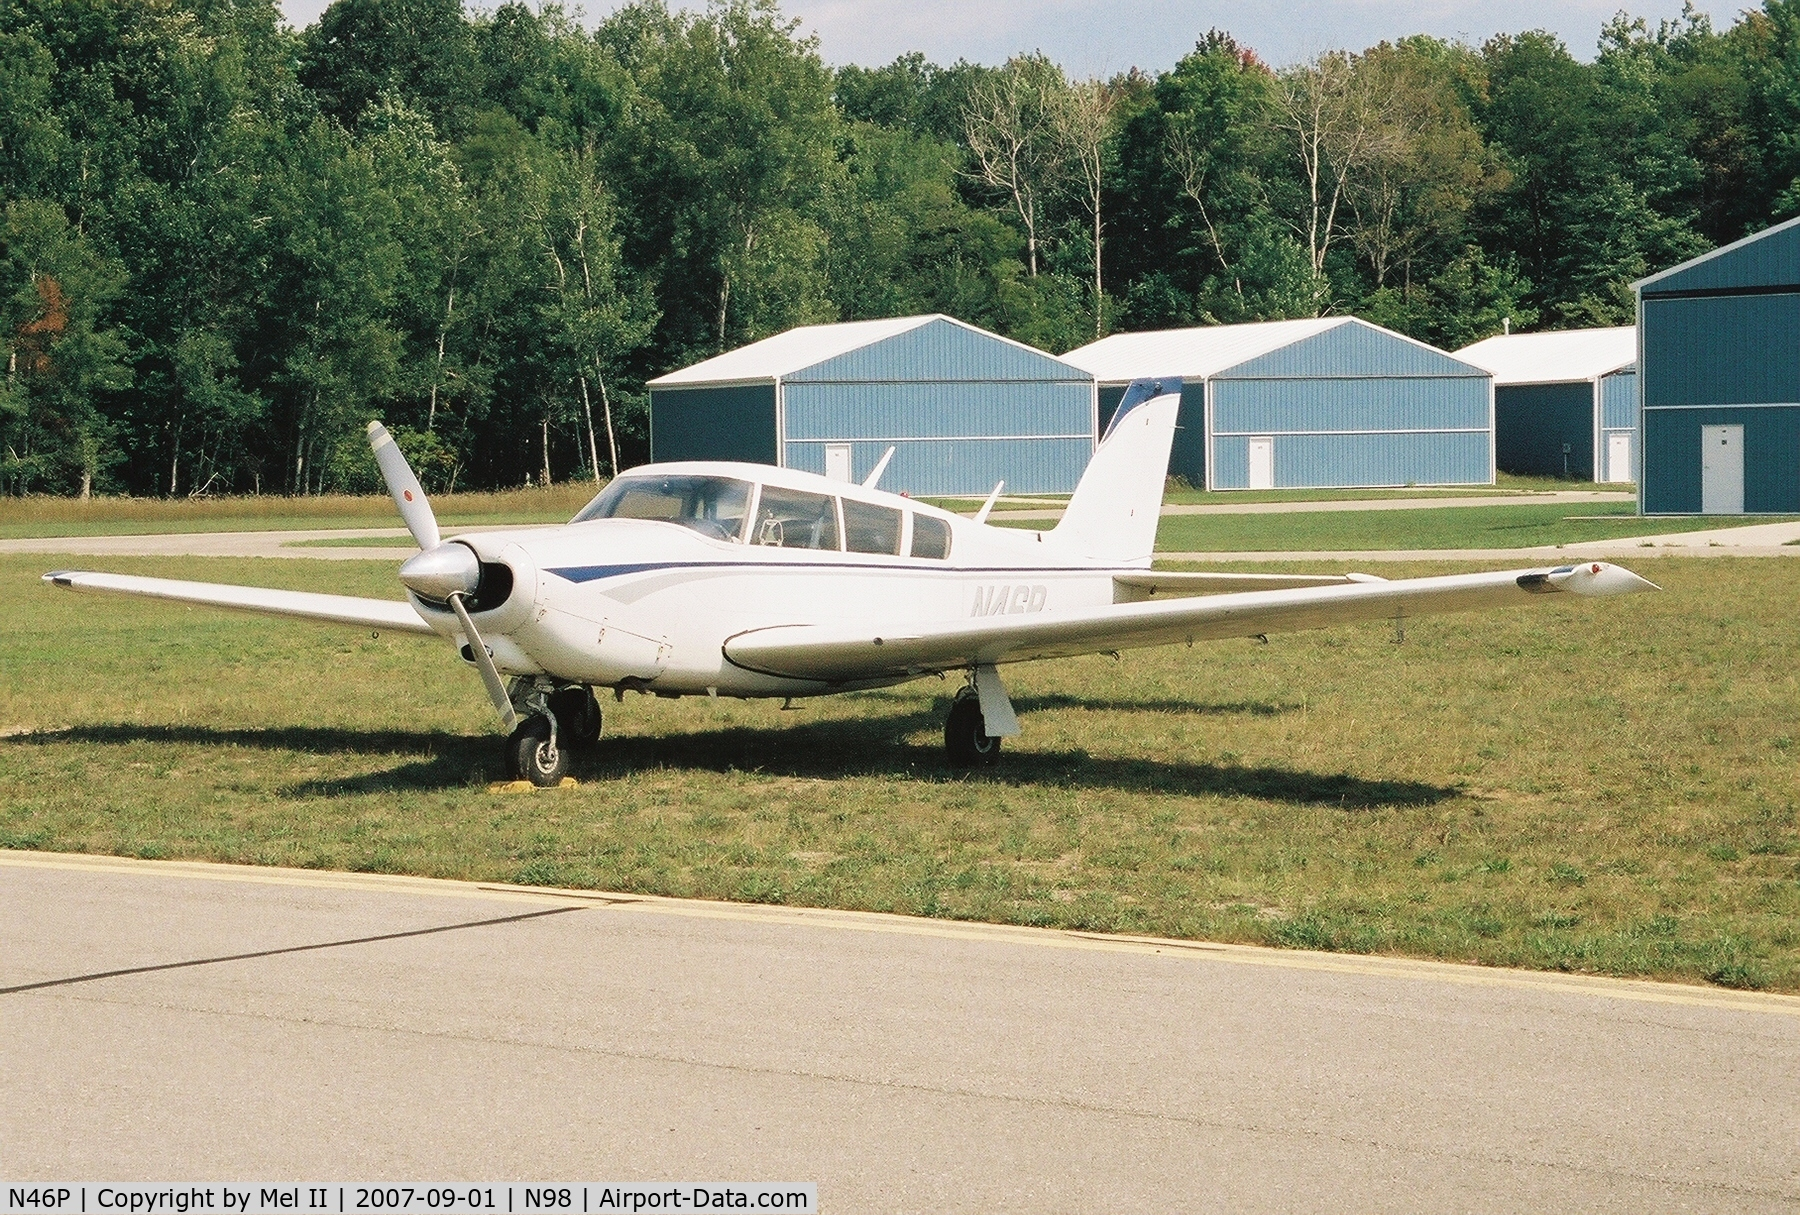 N46P, 1966 Piper PA-24-260 Comanche B C/N 24-4470, Parked @ Boyne City Municipal Airport (N98)